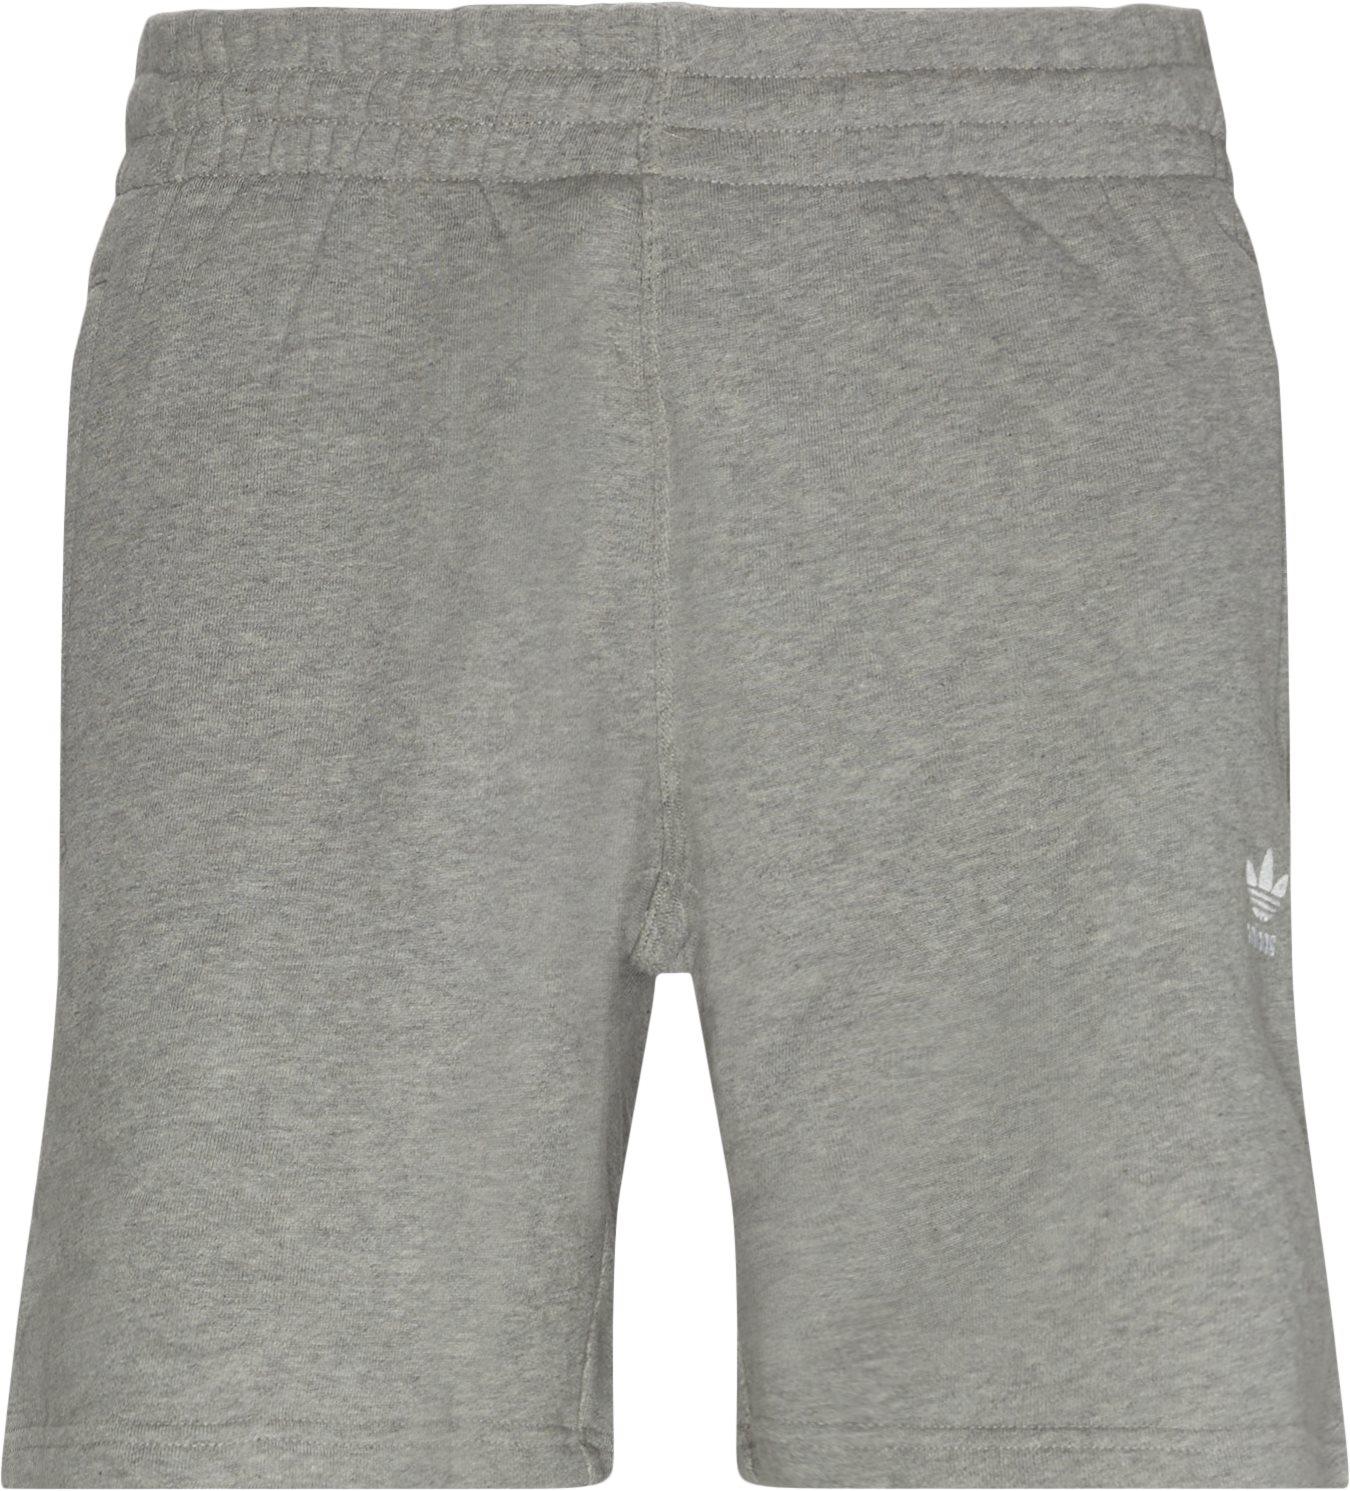 Essential Shorts - Shorts - Regular fit - Grå